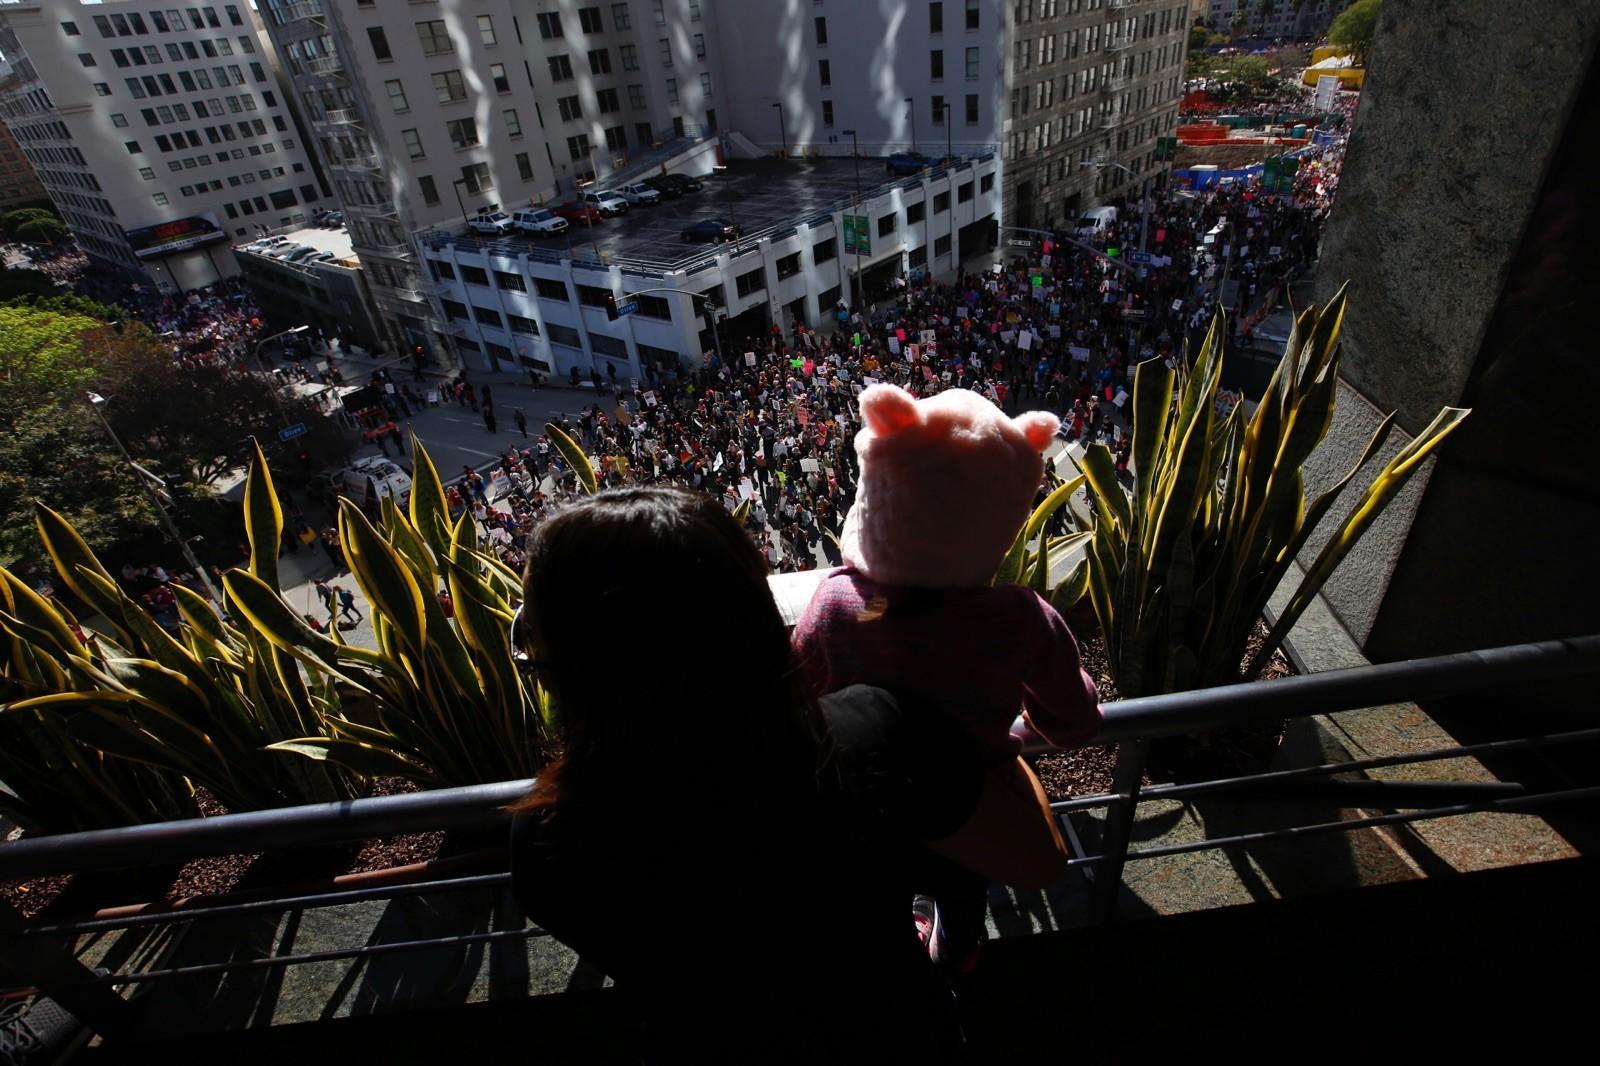 (Francine Orr / Los Angeles Times)